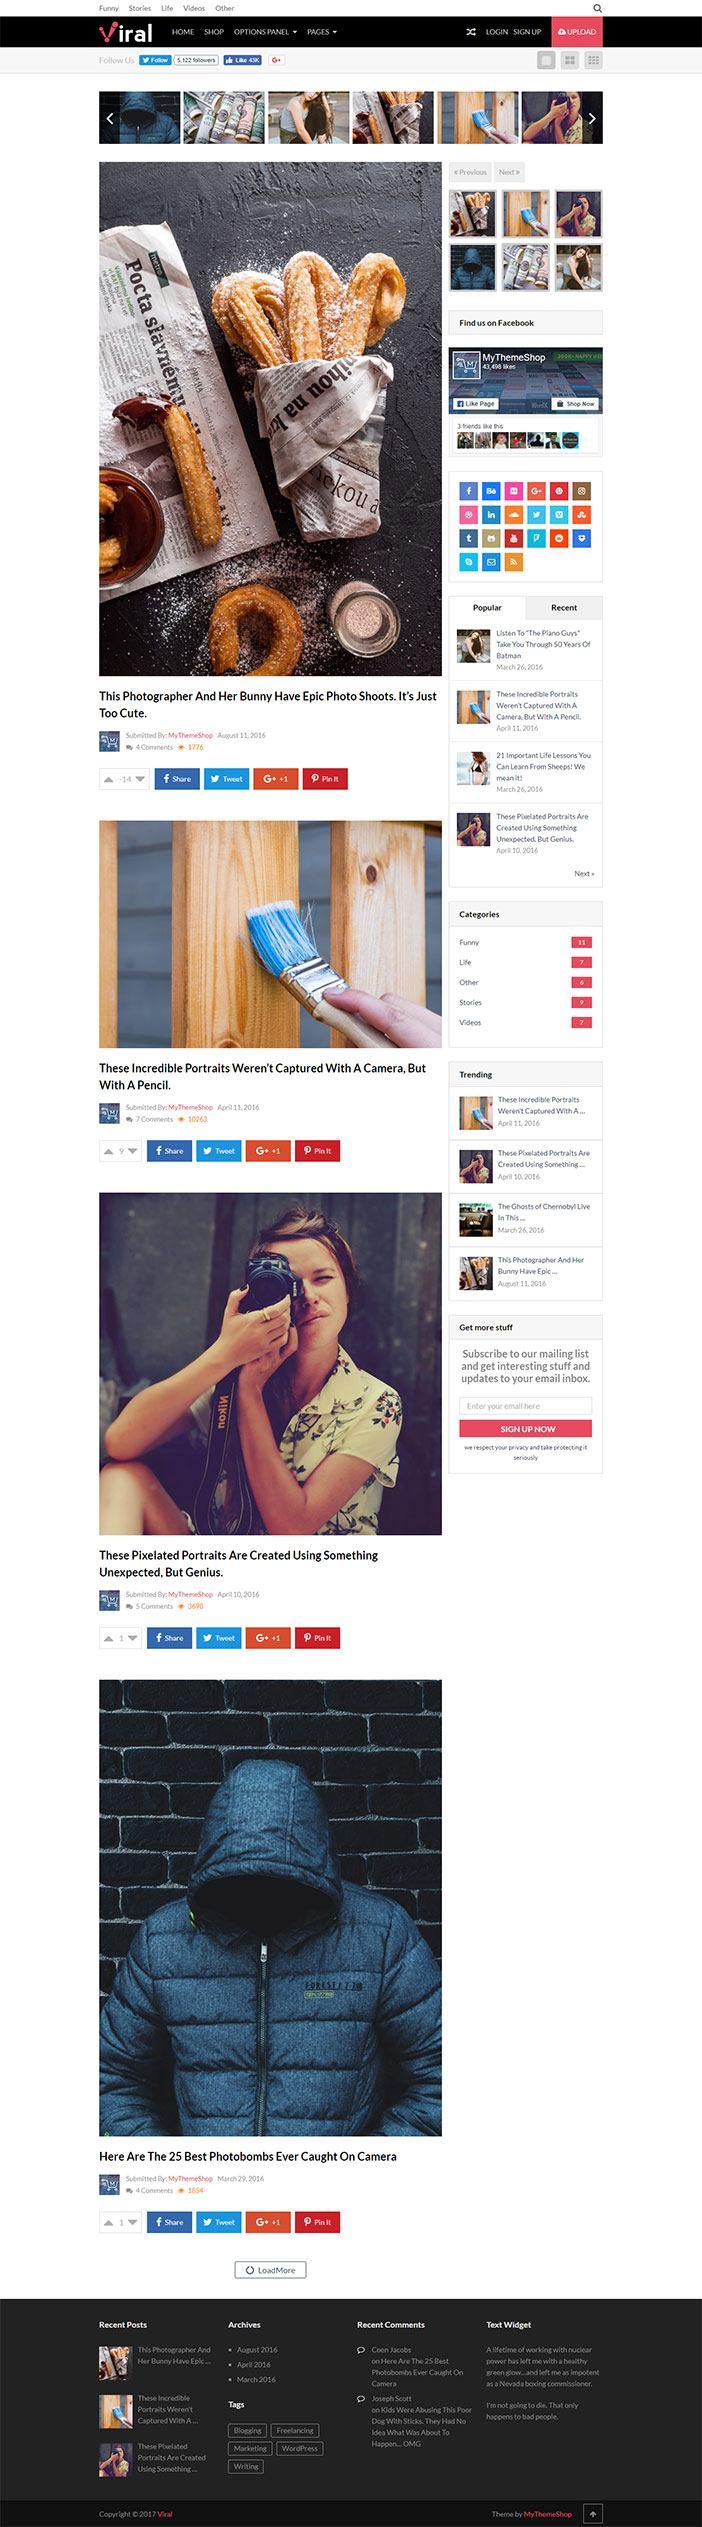 The Viral WordPress Theme